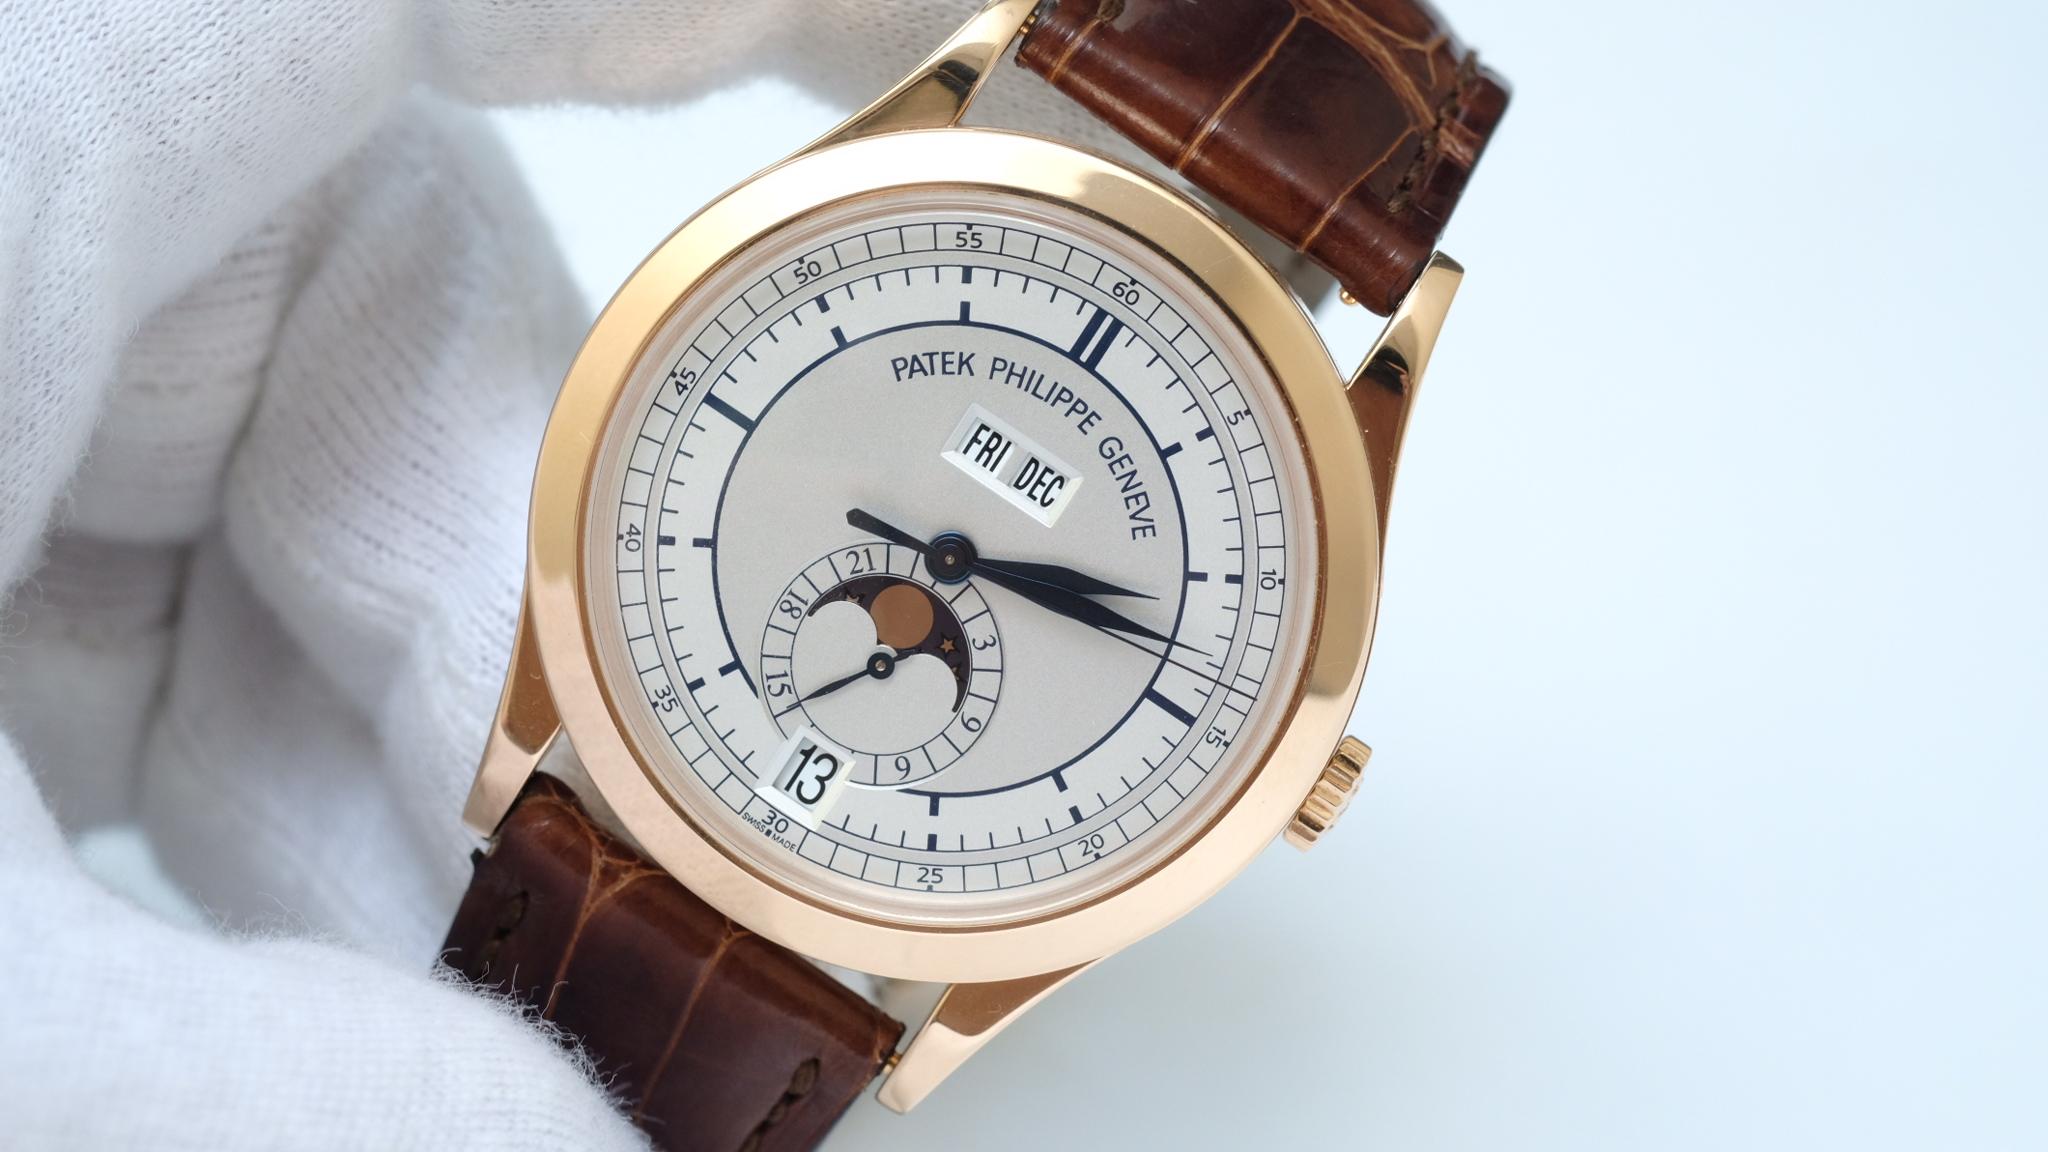 Đồng hồ Patek Philippe 5396R-001